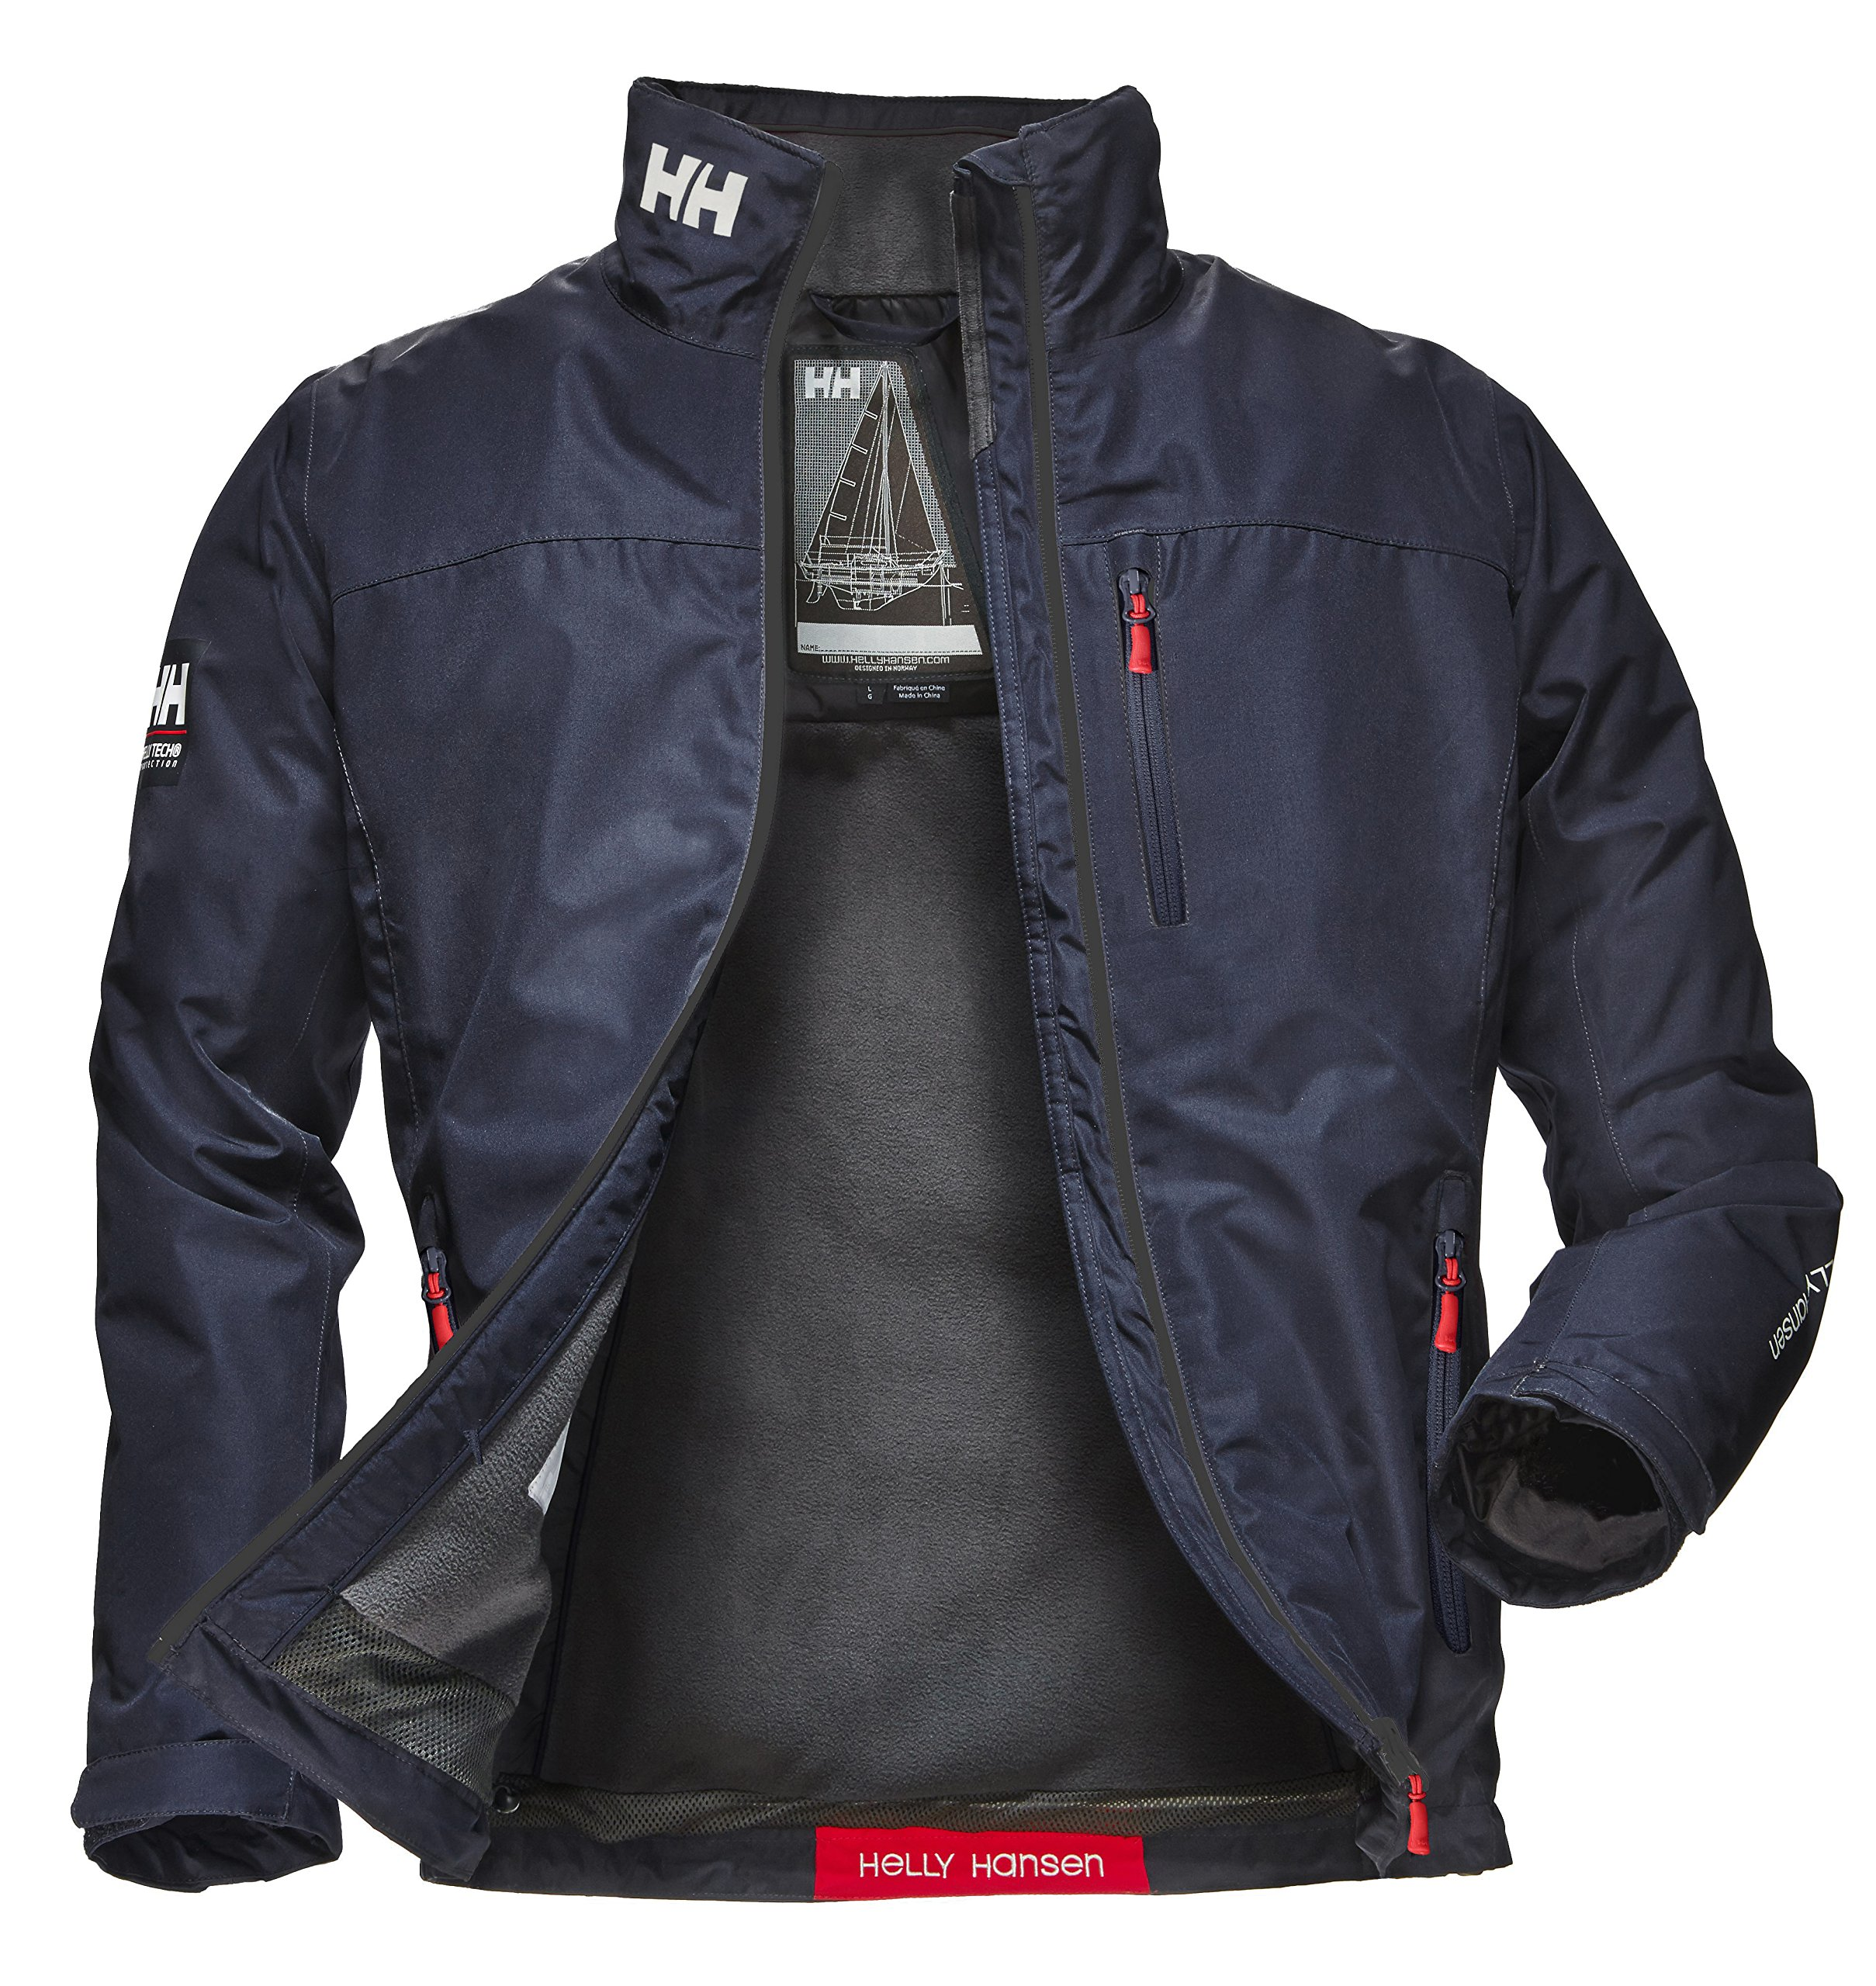 Helly Hansen Crew Midlayer Chaqueta Impermeable para Hombre, Color Azul (Azul Navy), Talla L